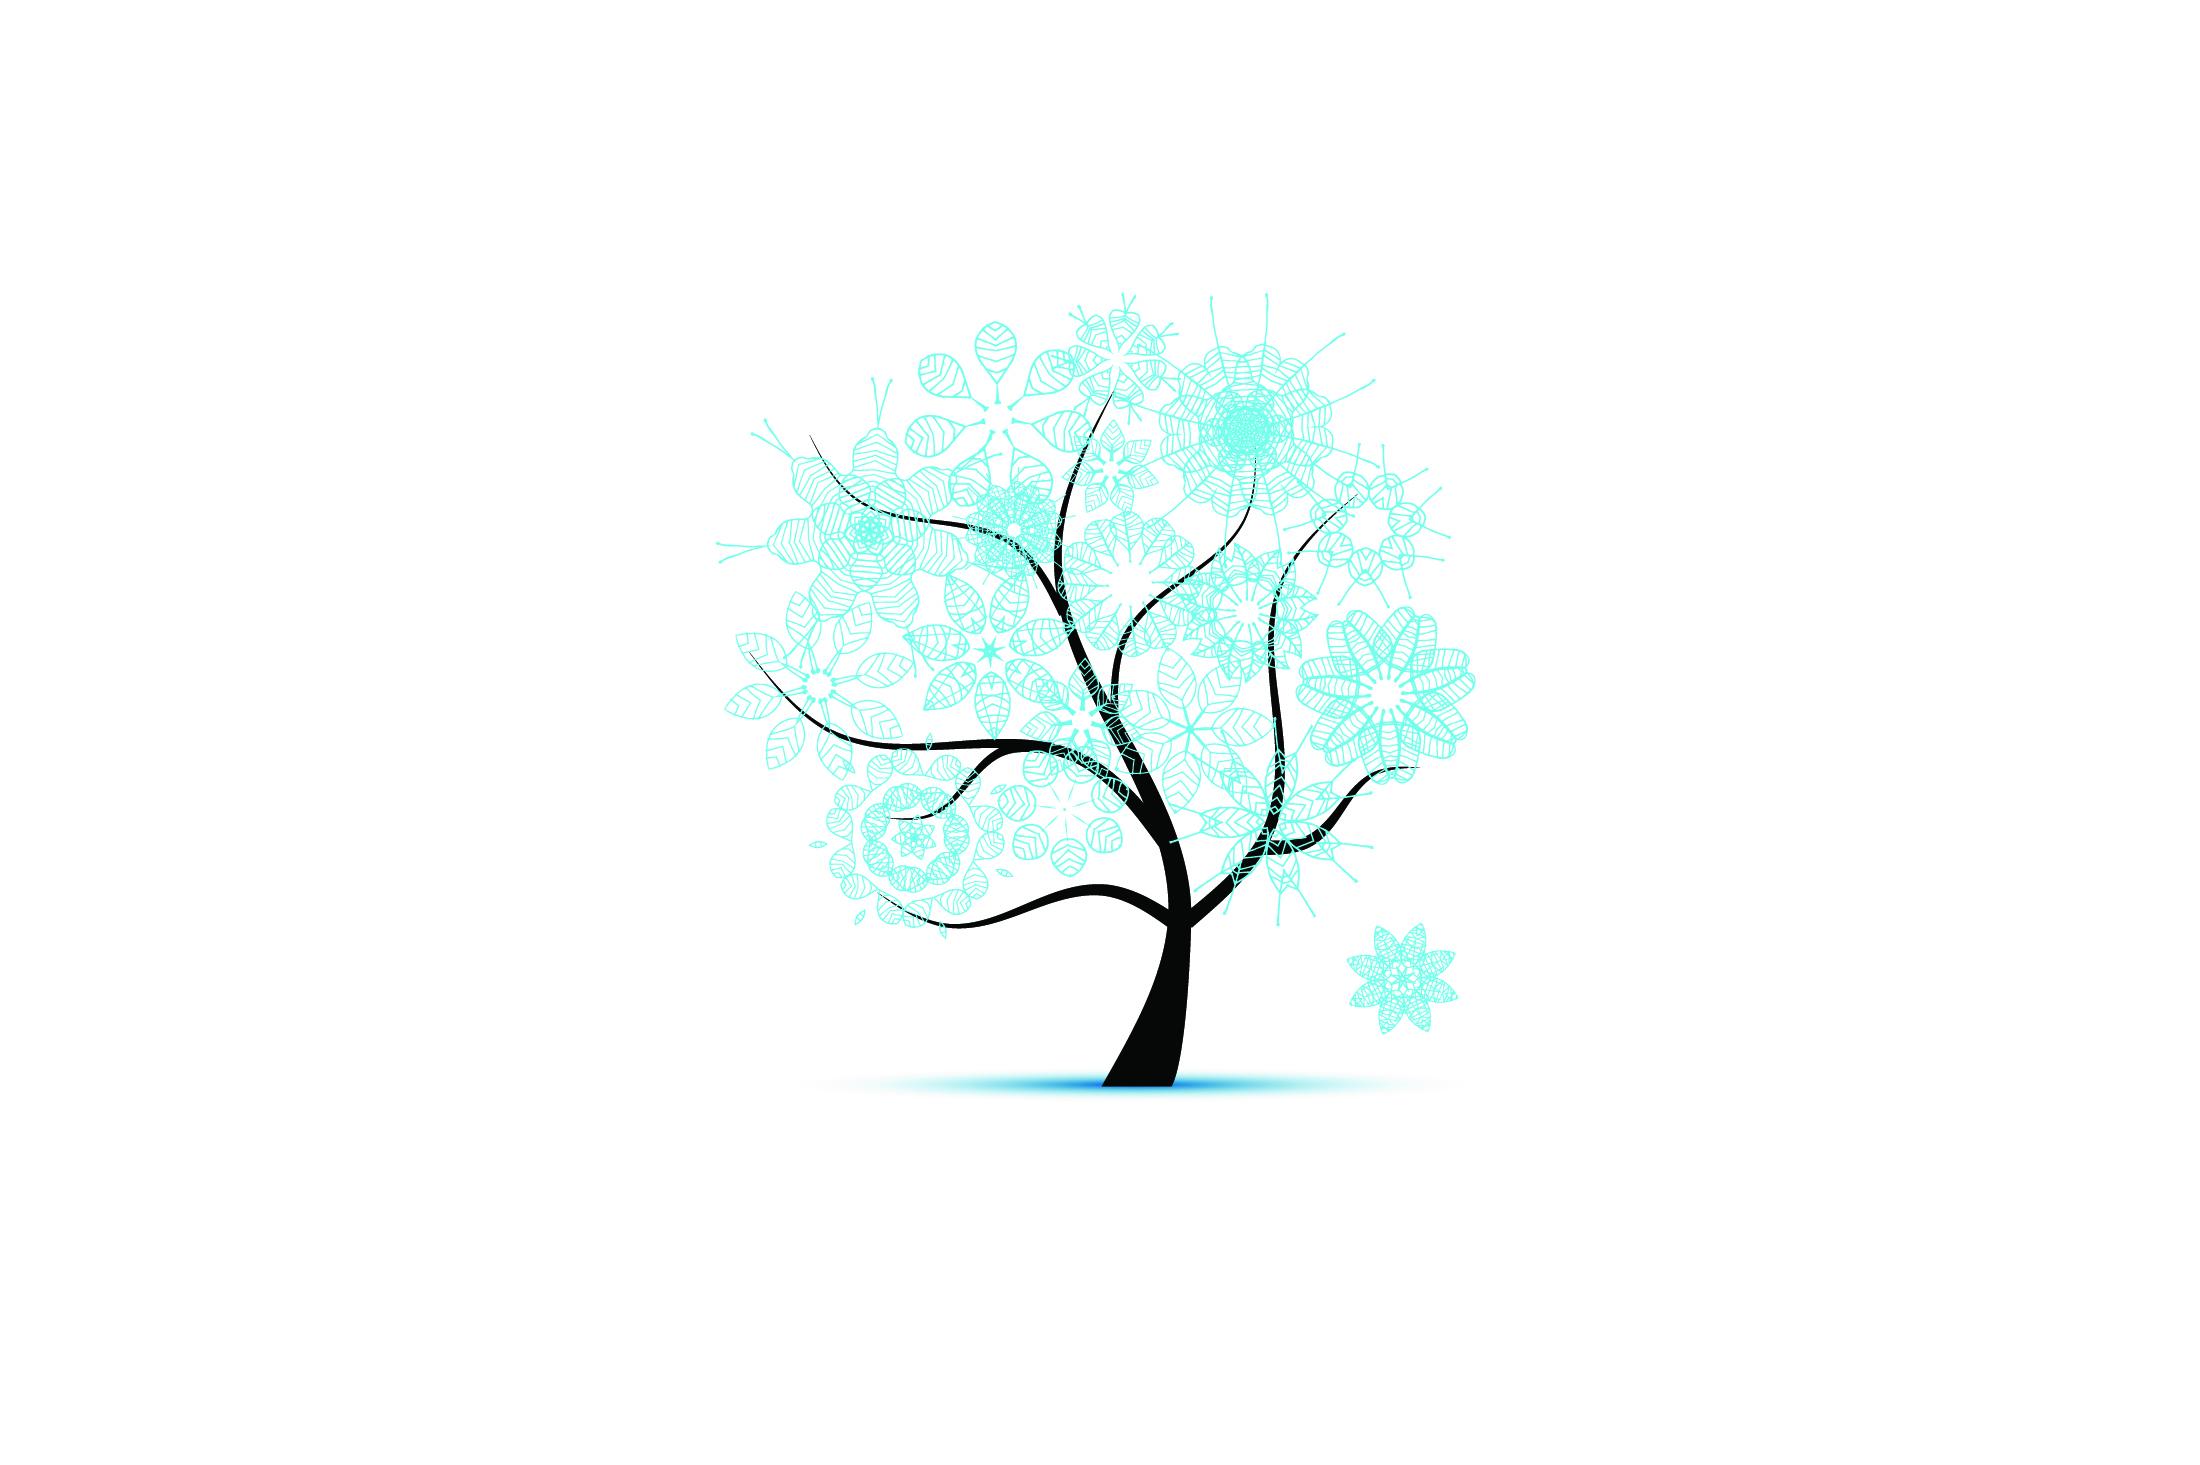 Drawn snow walpaper Snow photos wallpapers wallpapers Tree